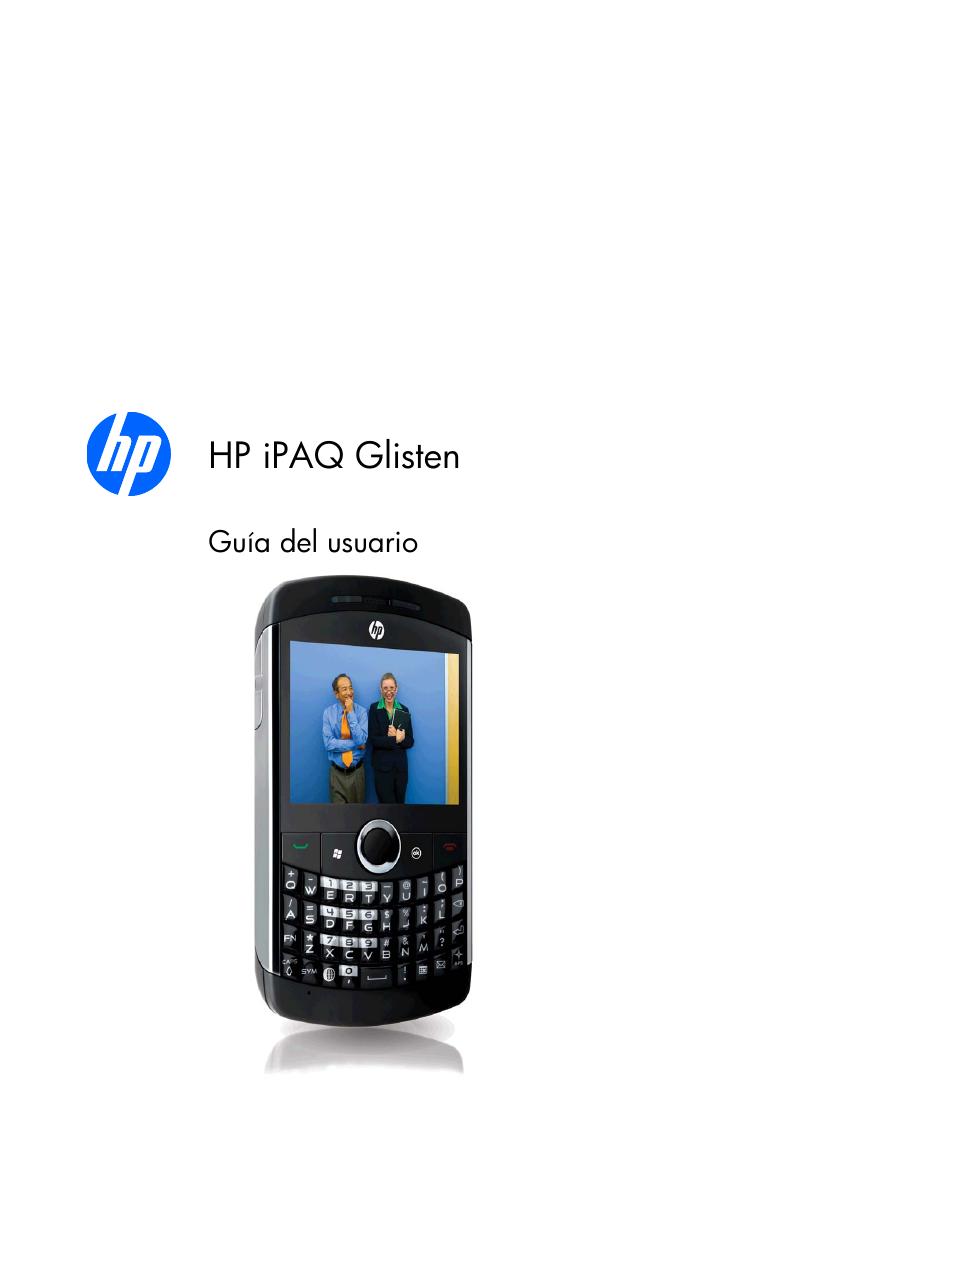 hp ipaq glisten manual del usuario p ginas 185 rh pdfmanuales com